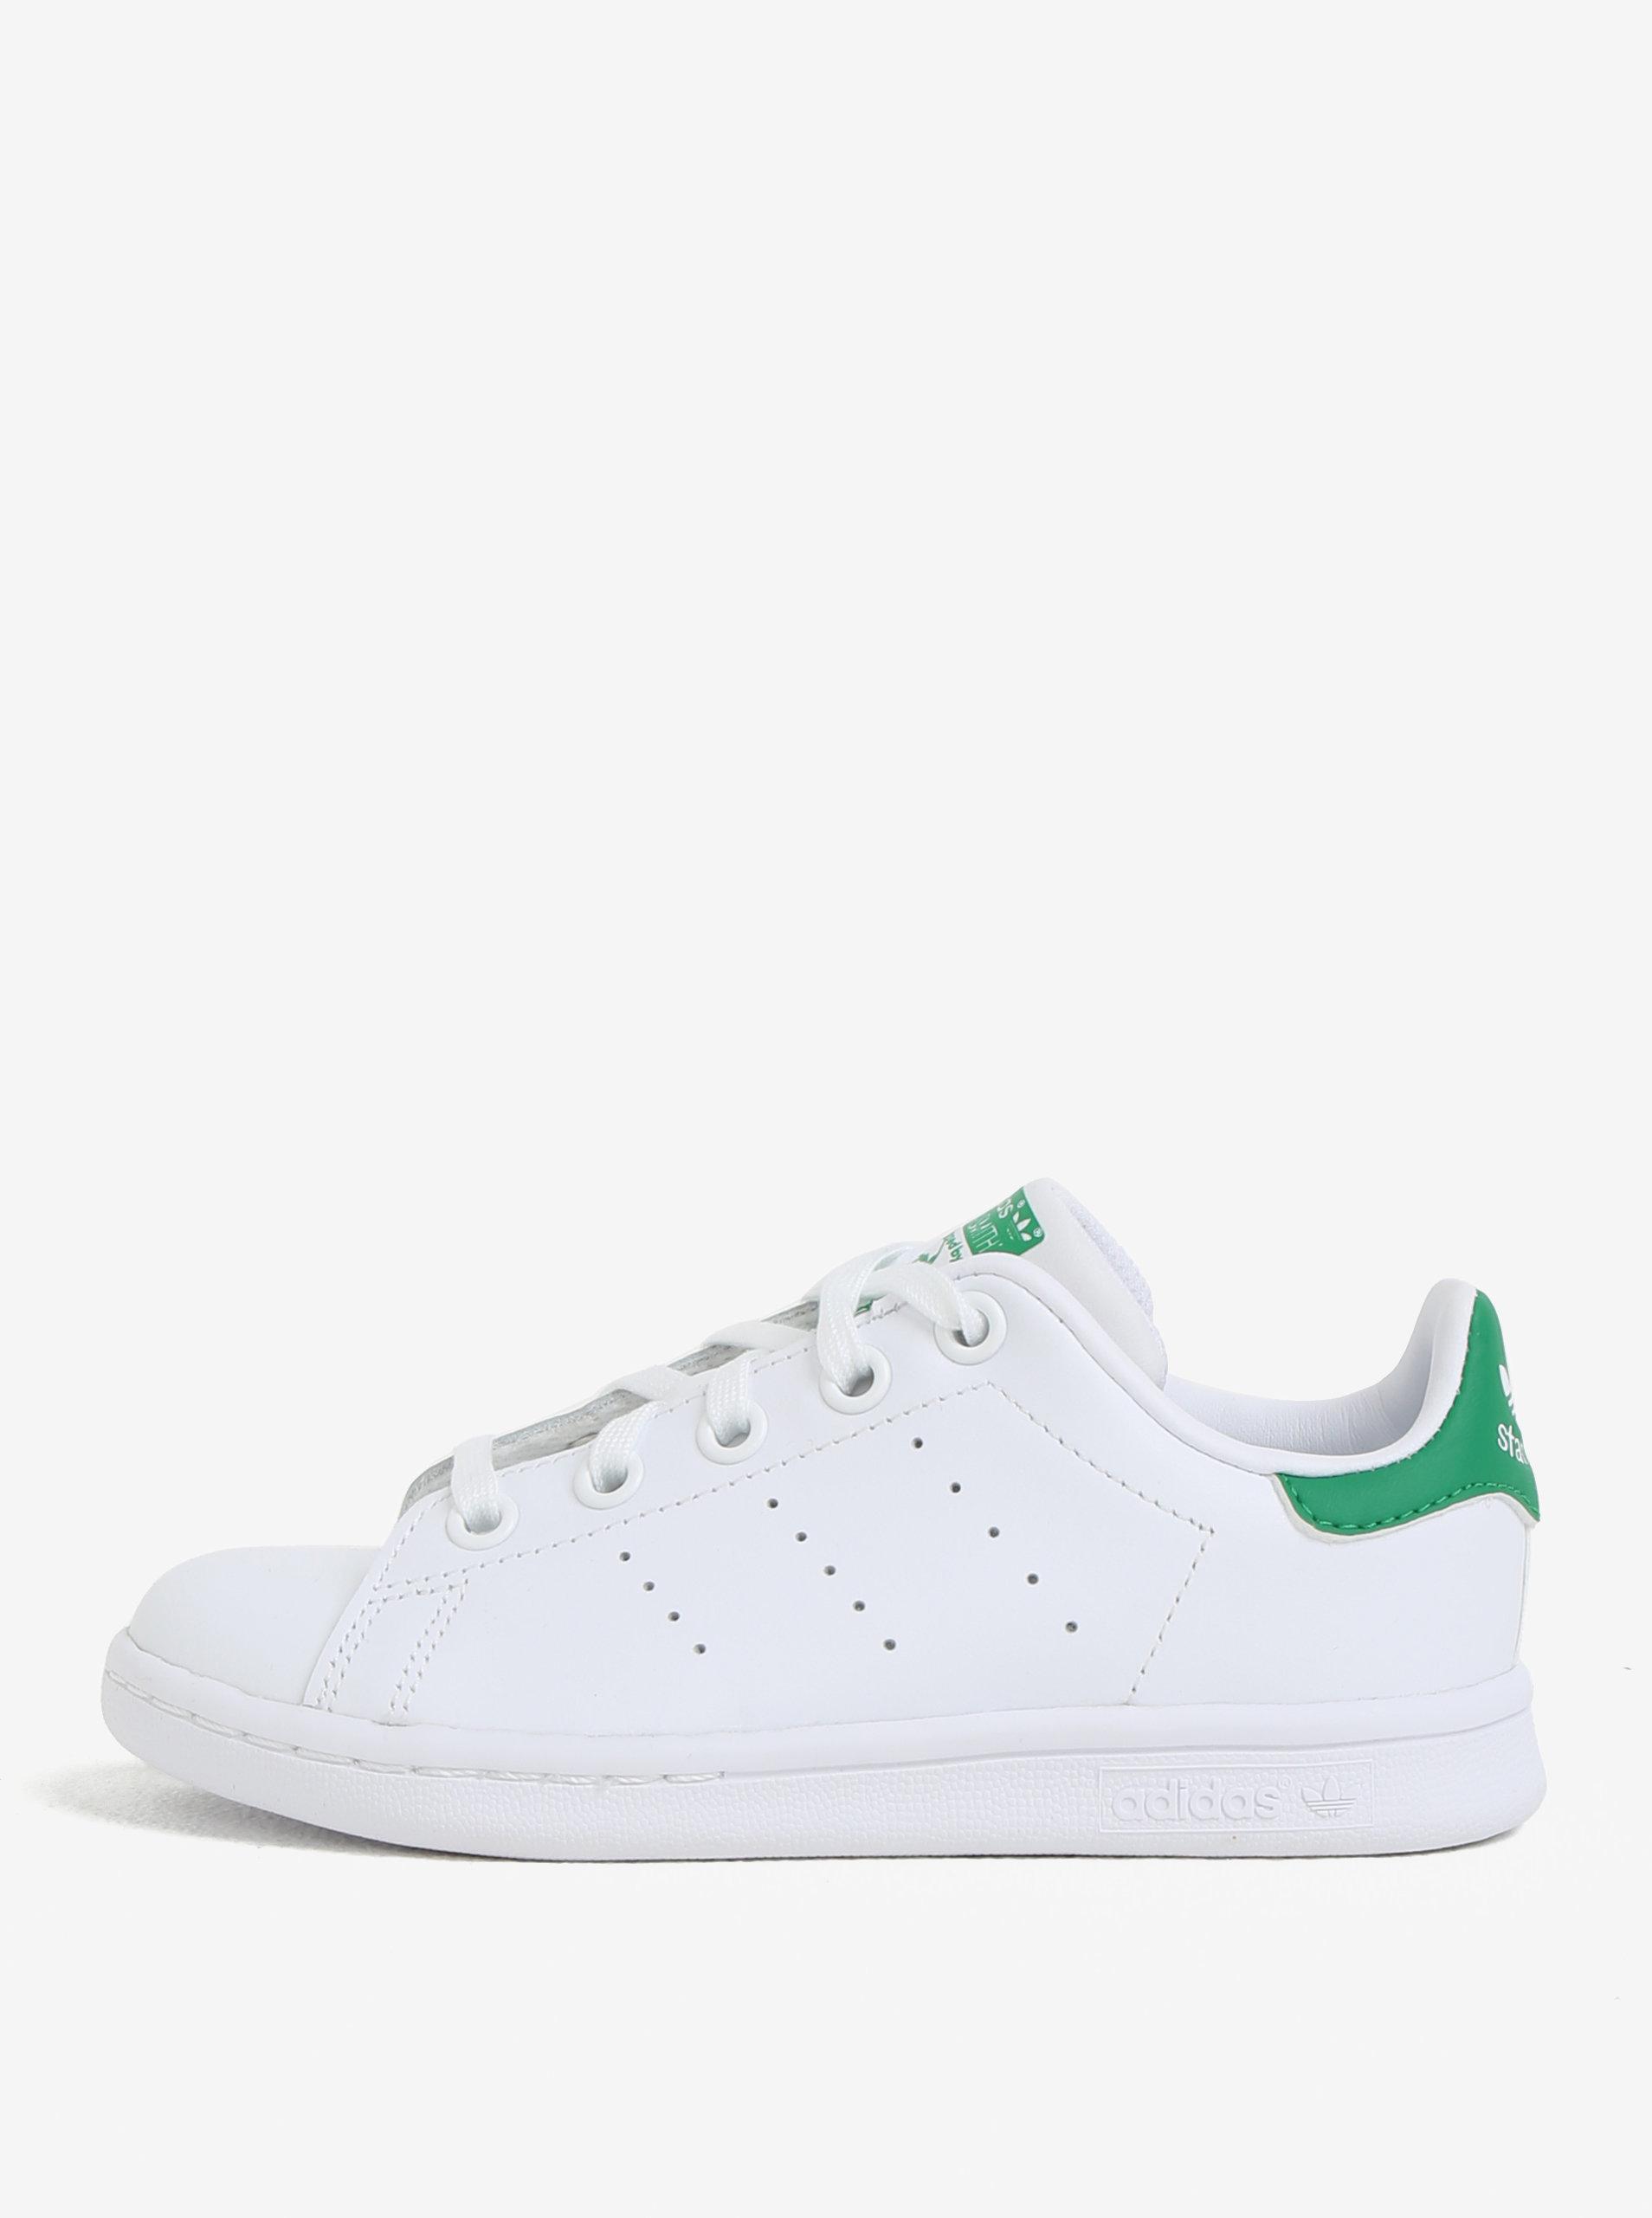 Zeleno-bílé dětské kožené tenisky adidas Originals Stan Smith C ... b832dd322c